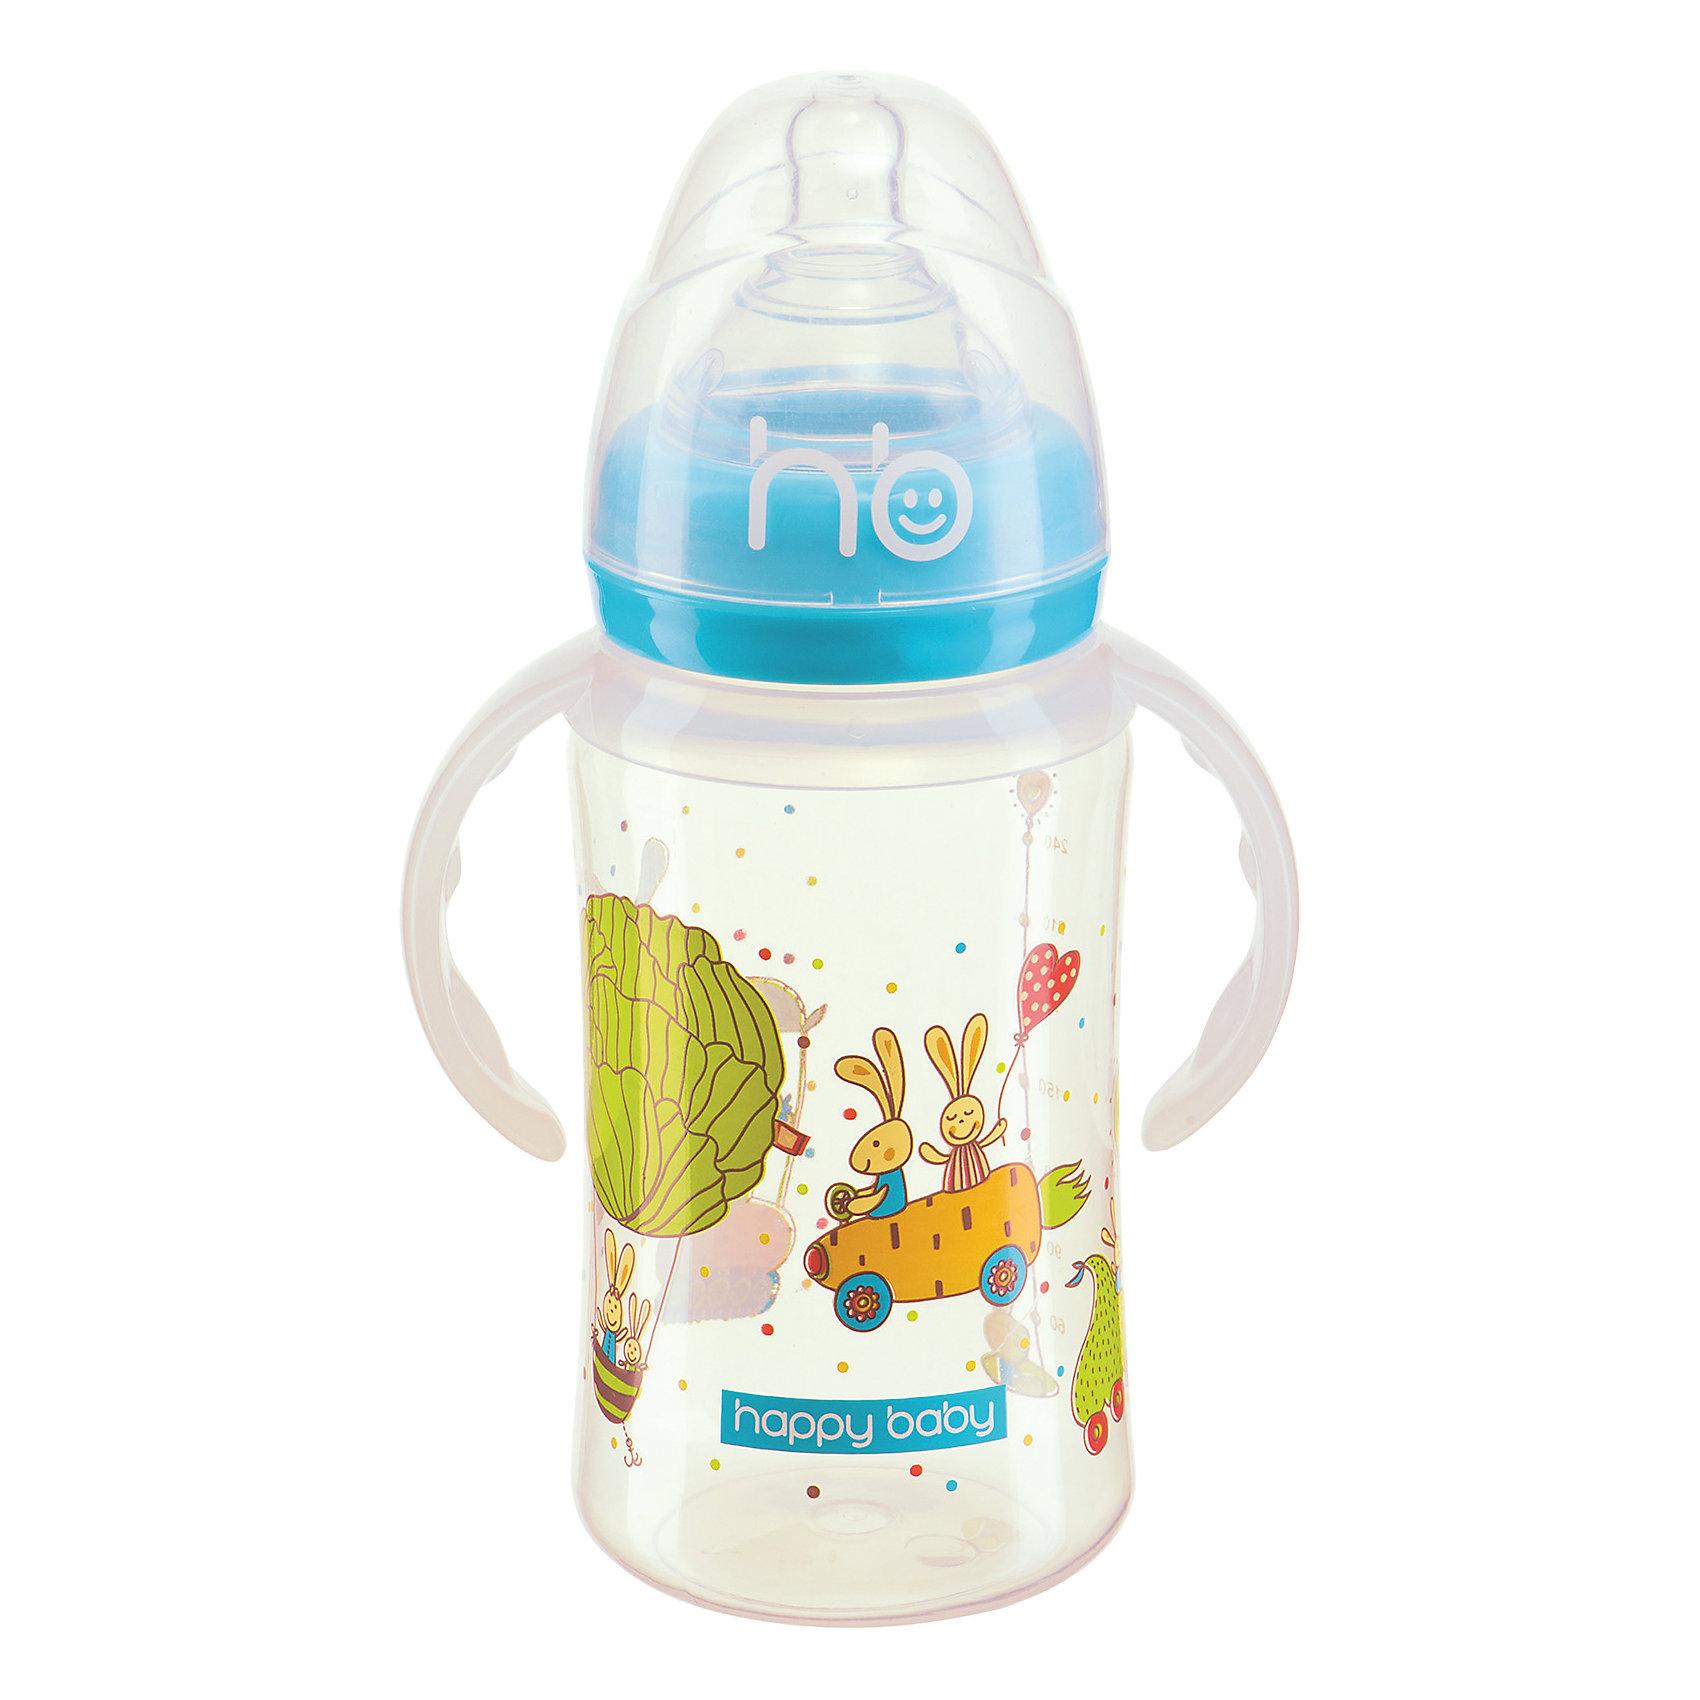 Happy Baby Бутылочка для кормления с ручками, 240 мл, Happy Baby, голубой happy baby ходунки smiley v2 цвет голубой